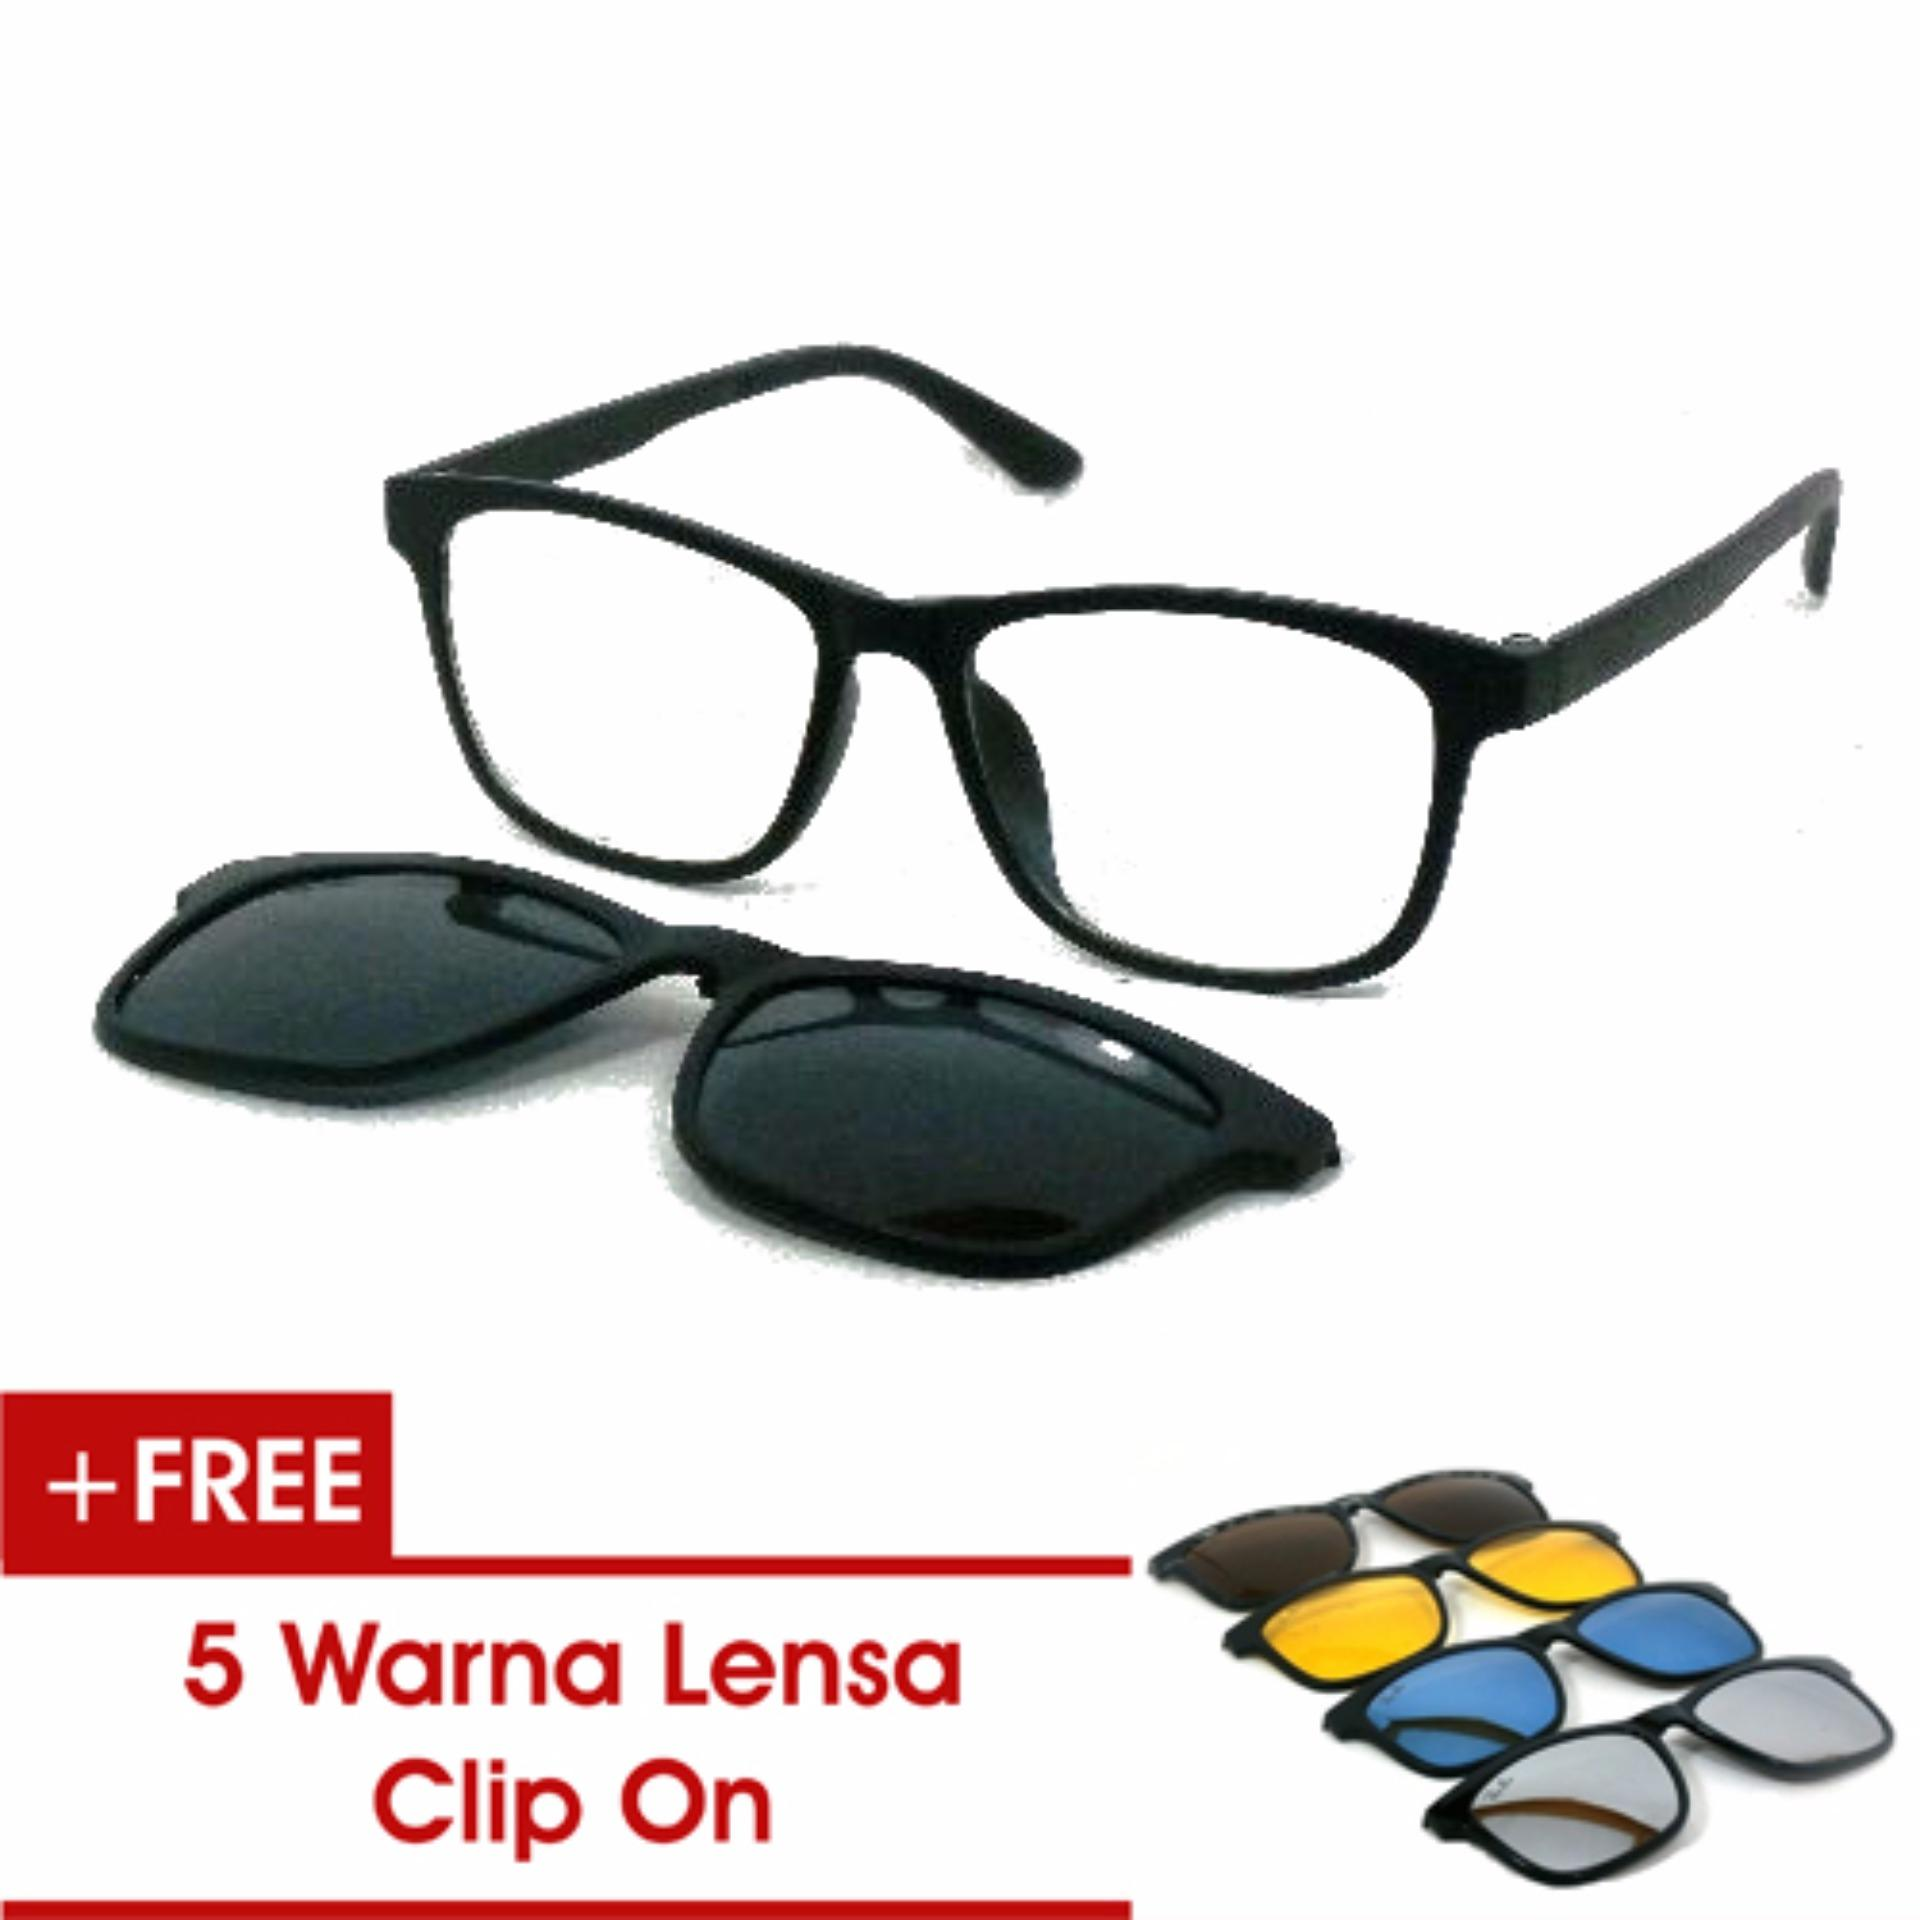 ... Frame Kacamata Baca Minus Anti Radiasi Komputer Clip On 5 Lensa Warna  Sunglass Polaroid Night View ... 2a91623654